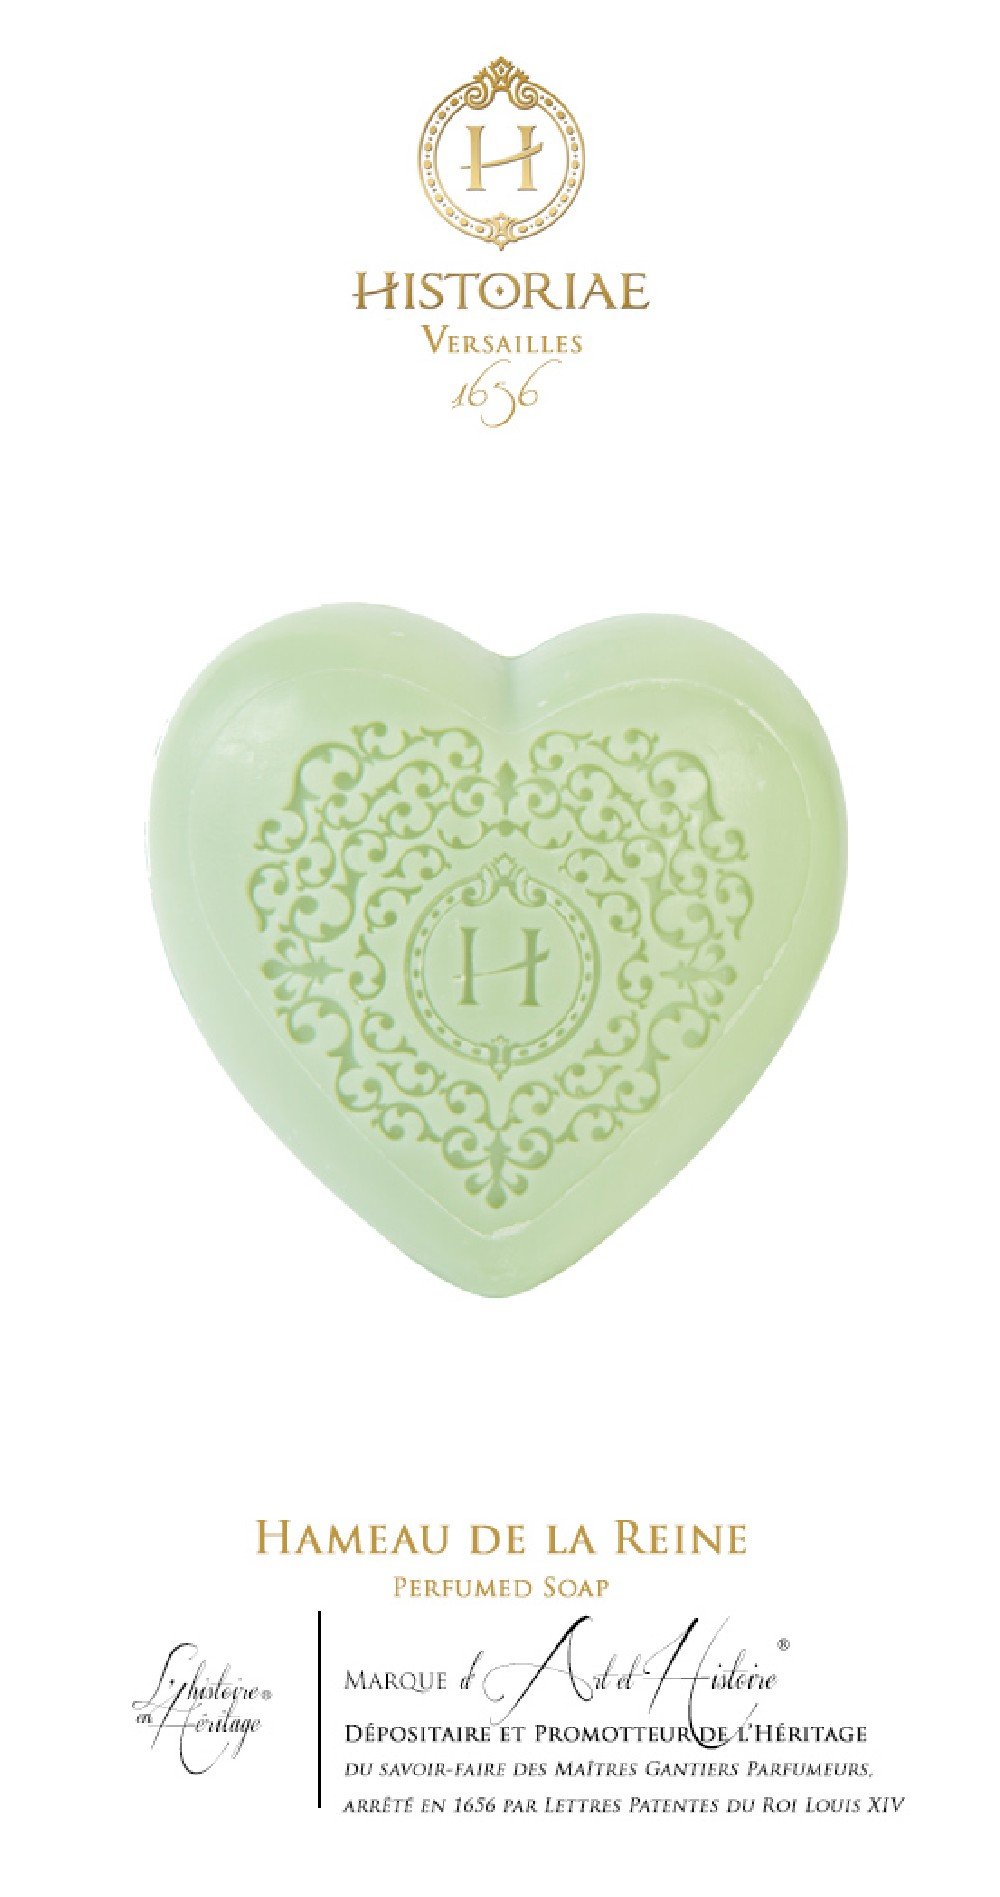 Hameau De La Reine Perfumed Soap Historiae Secrets